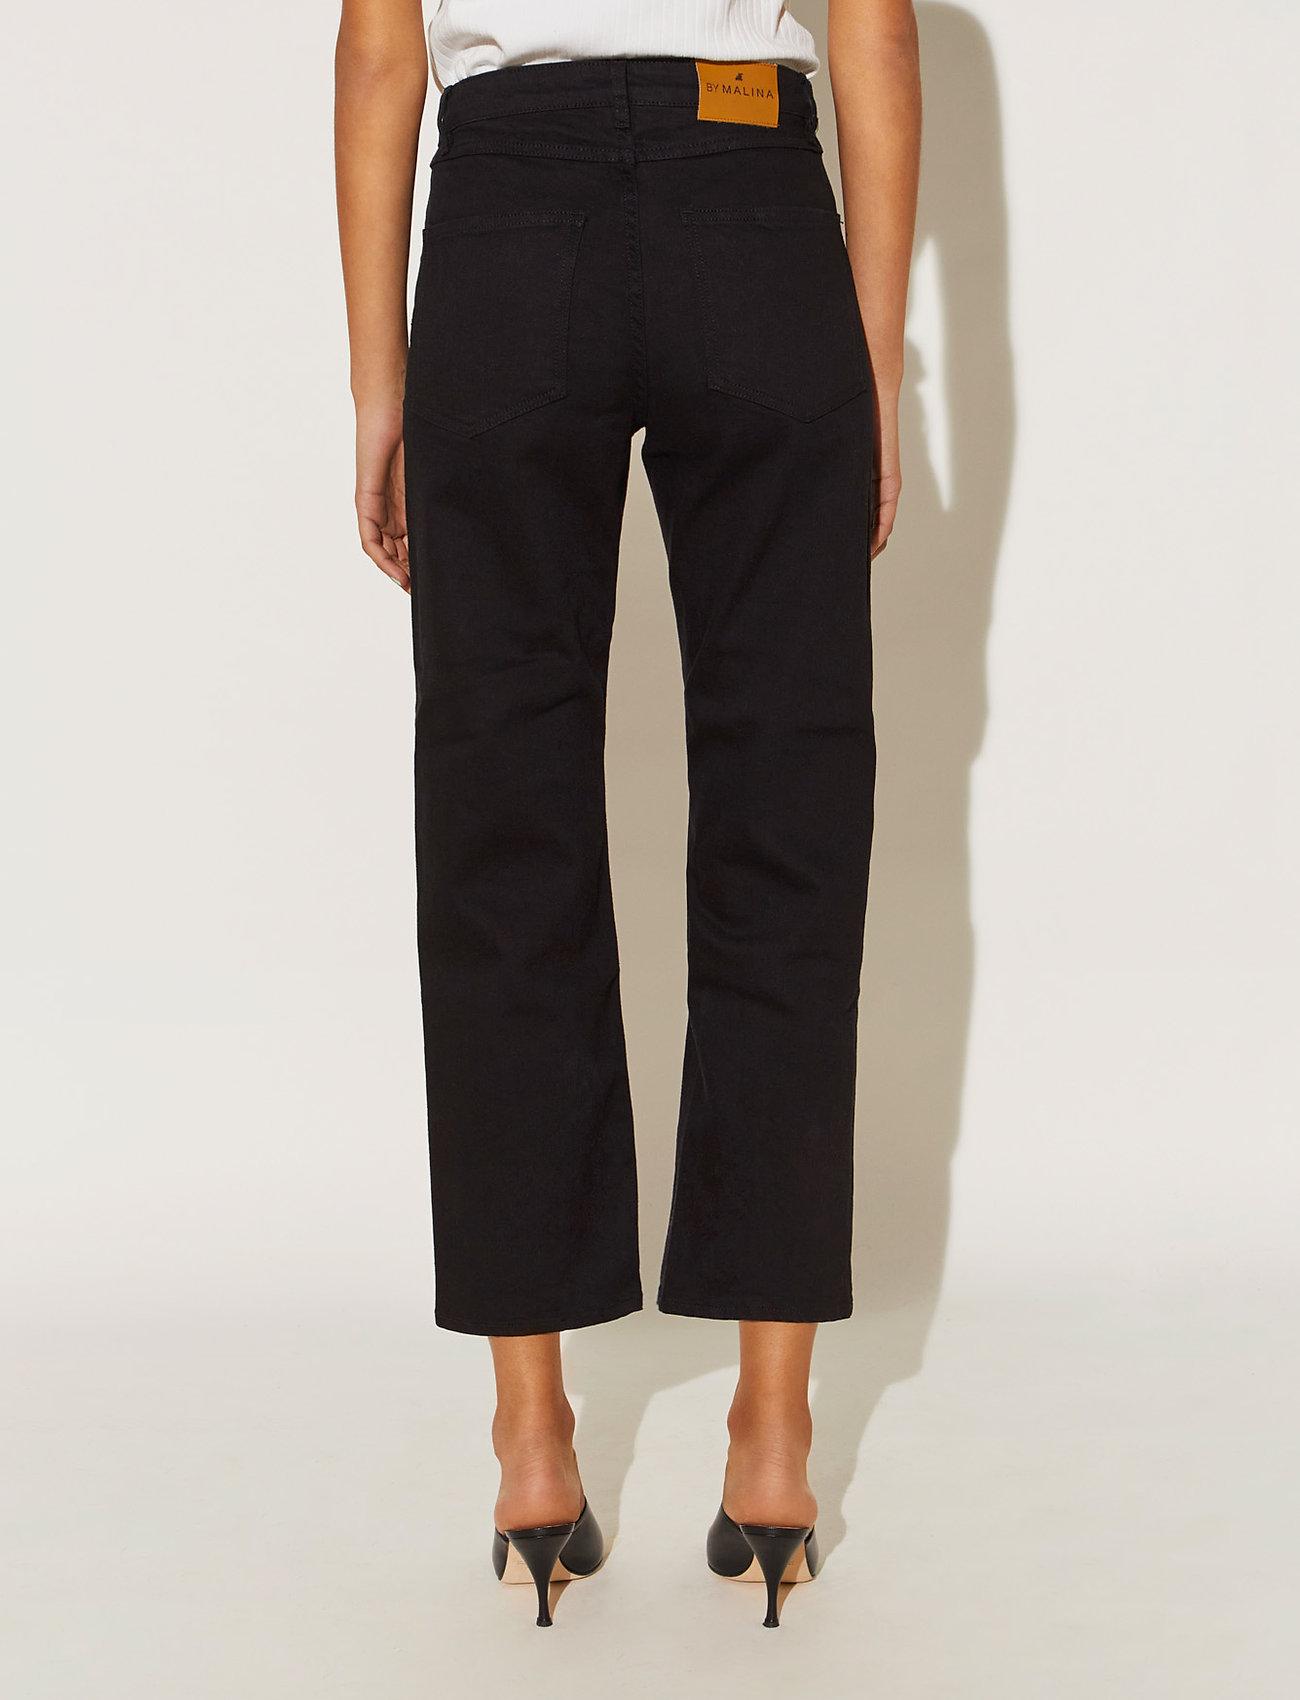 By Malina - Edith jeans - straight regular - black - 3